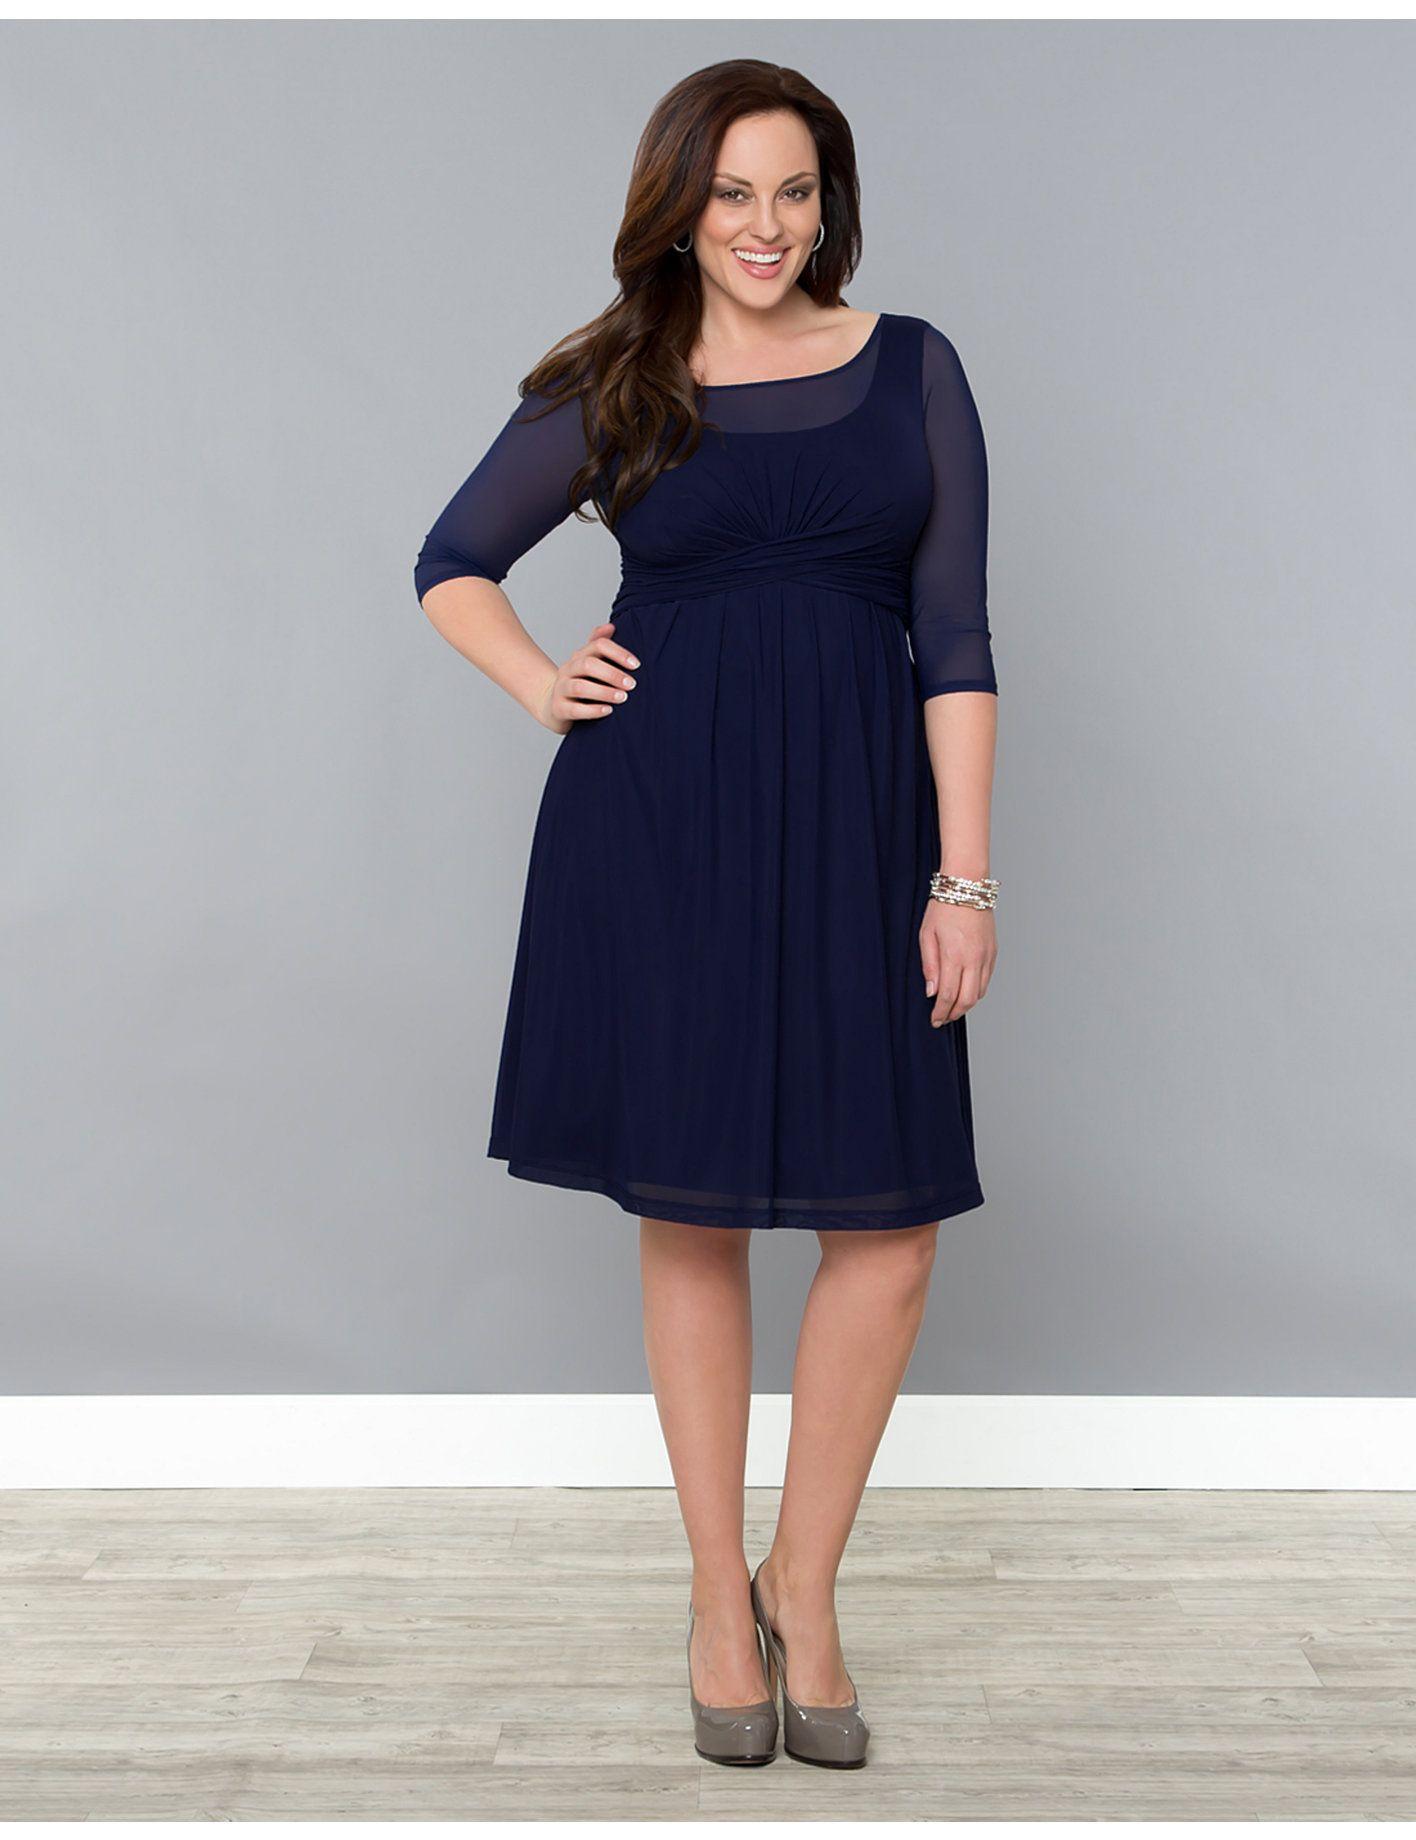 All Dresses & Skirts for Plus Size Women   Lane Bryant ...